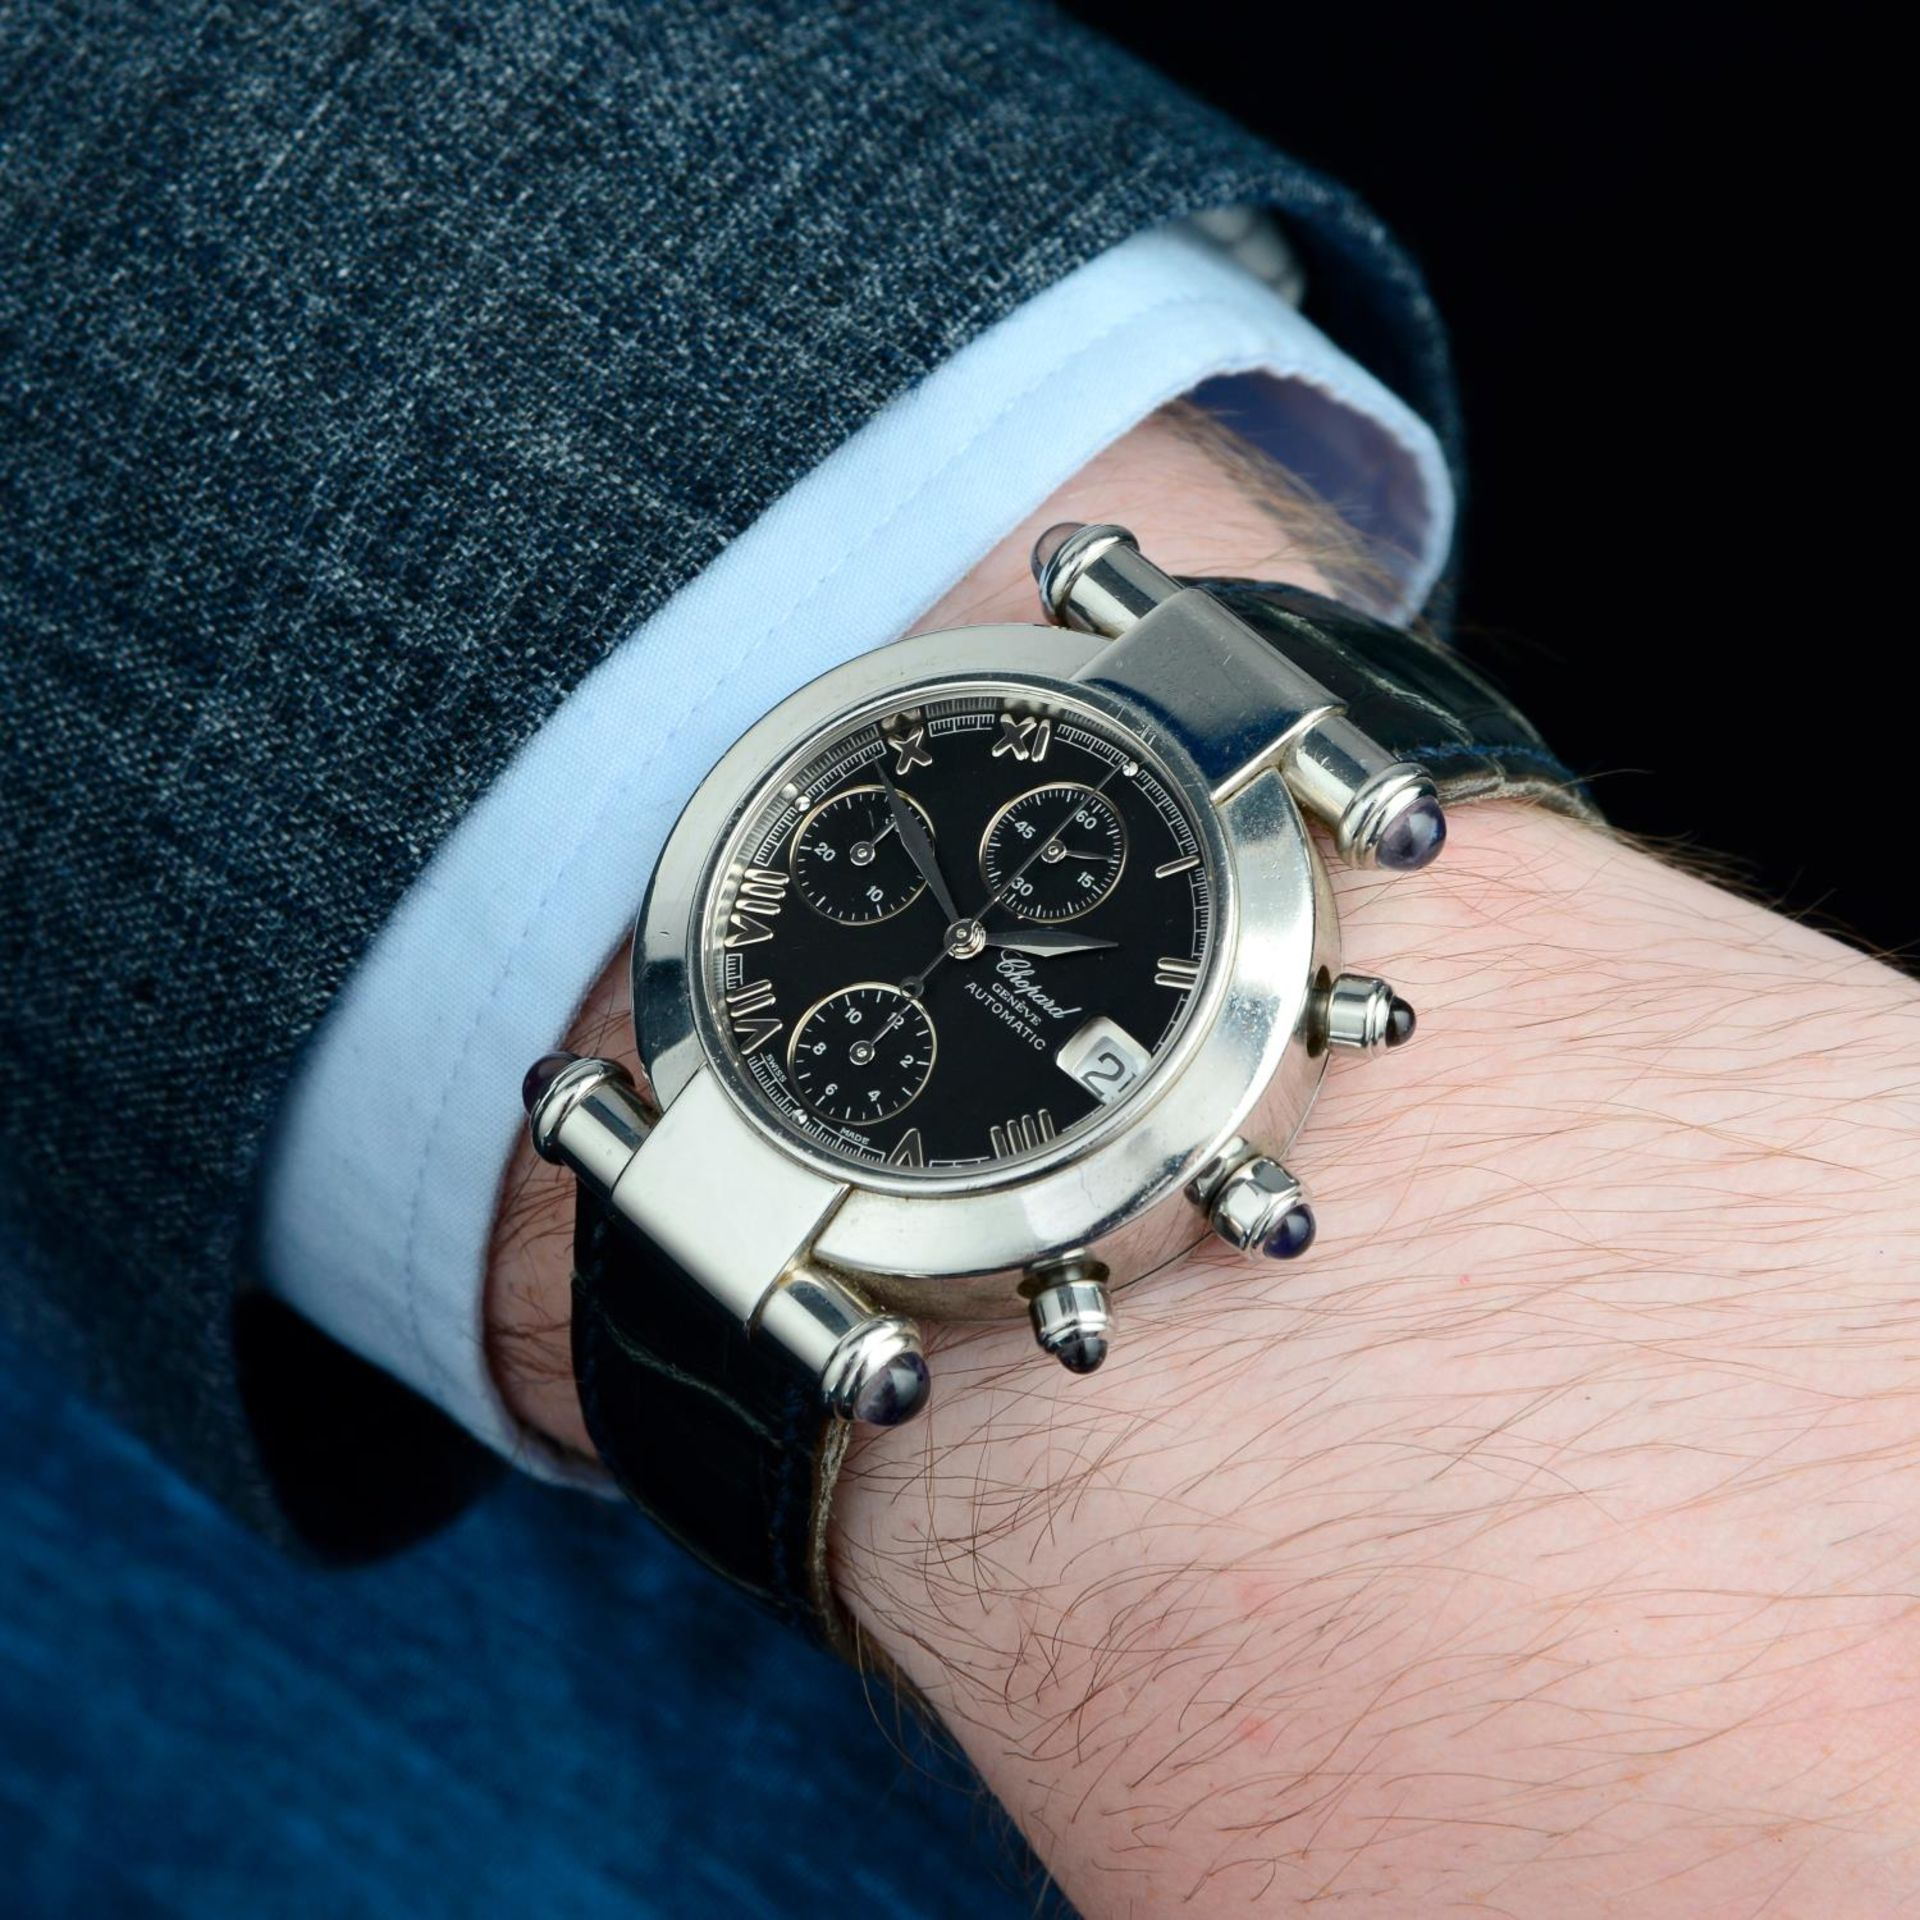 CHOPARD - an Imperiale chronograph wrist watch. - Bild 3 aus 5